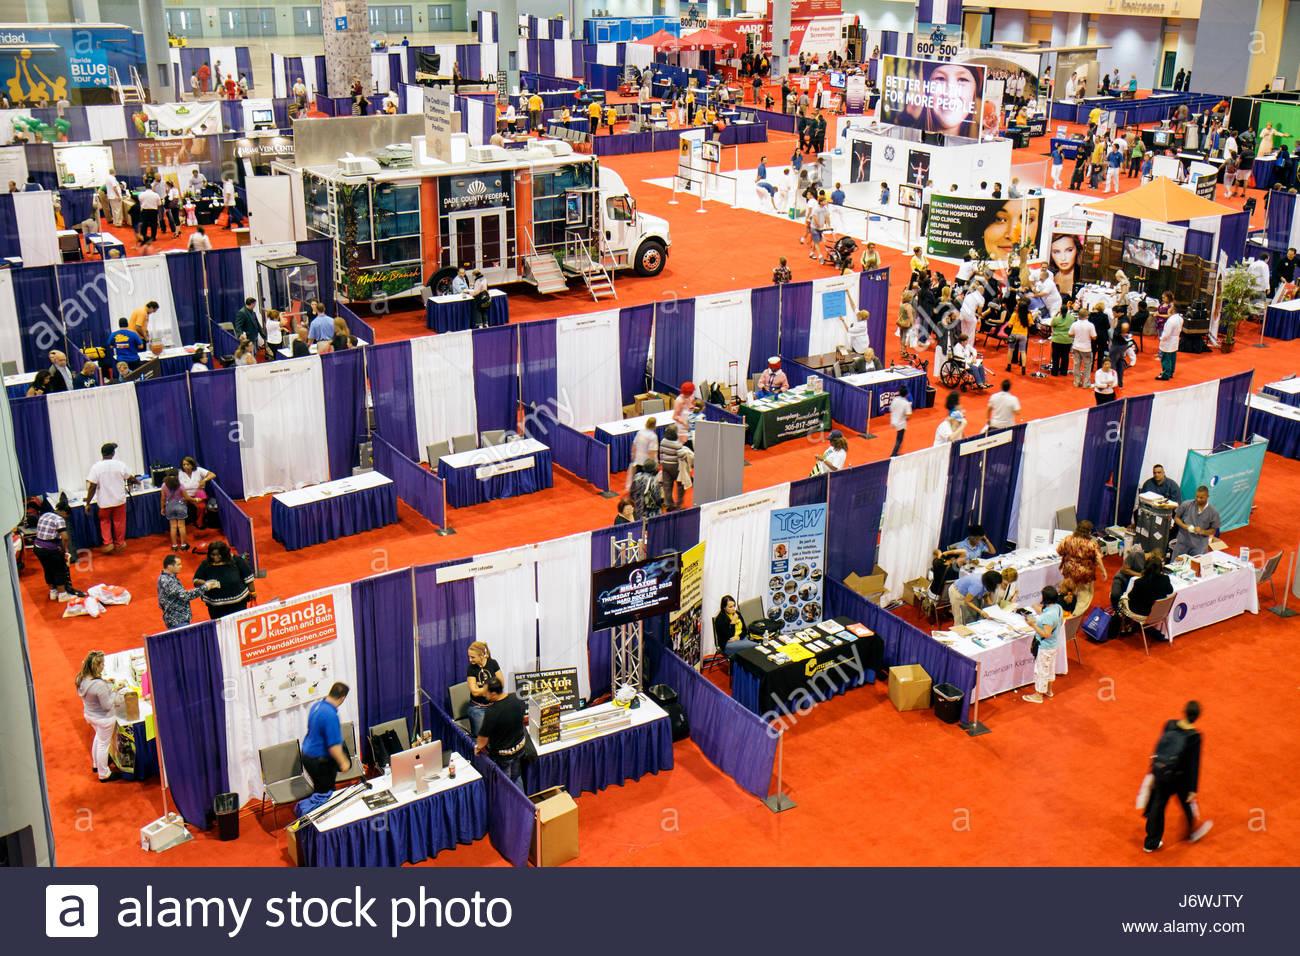 Miami Beach Miami Florida Beach Convention Center centre Health and Fitness Expo exhibitors - Stock Image